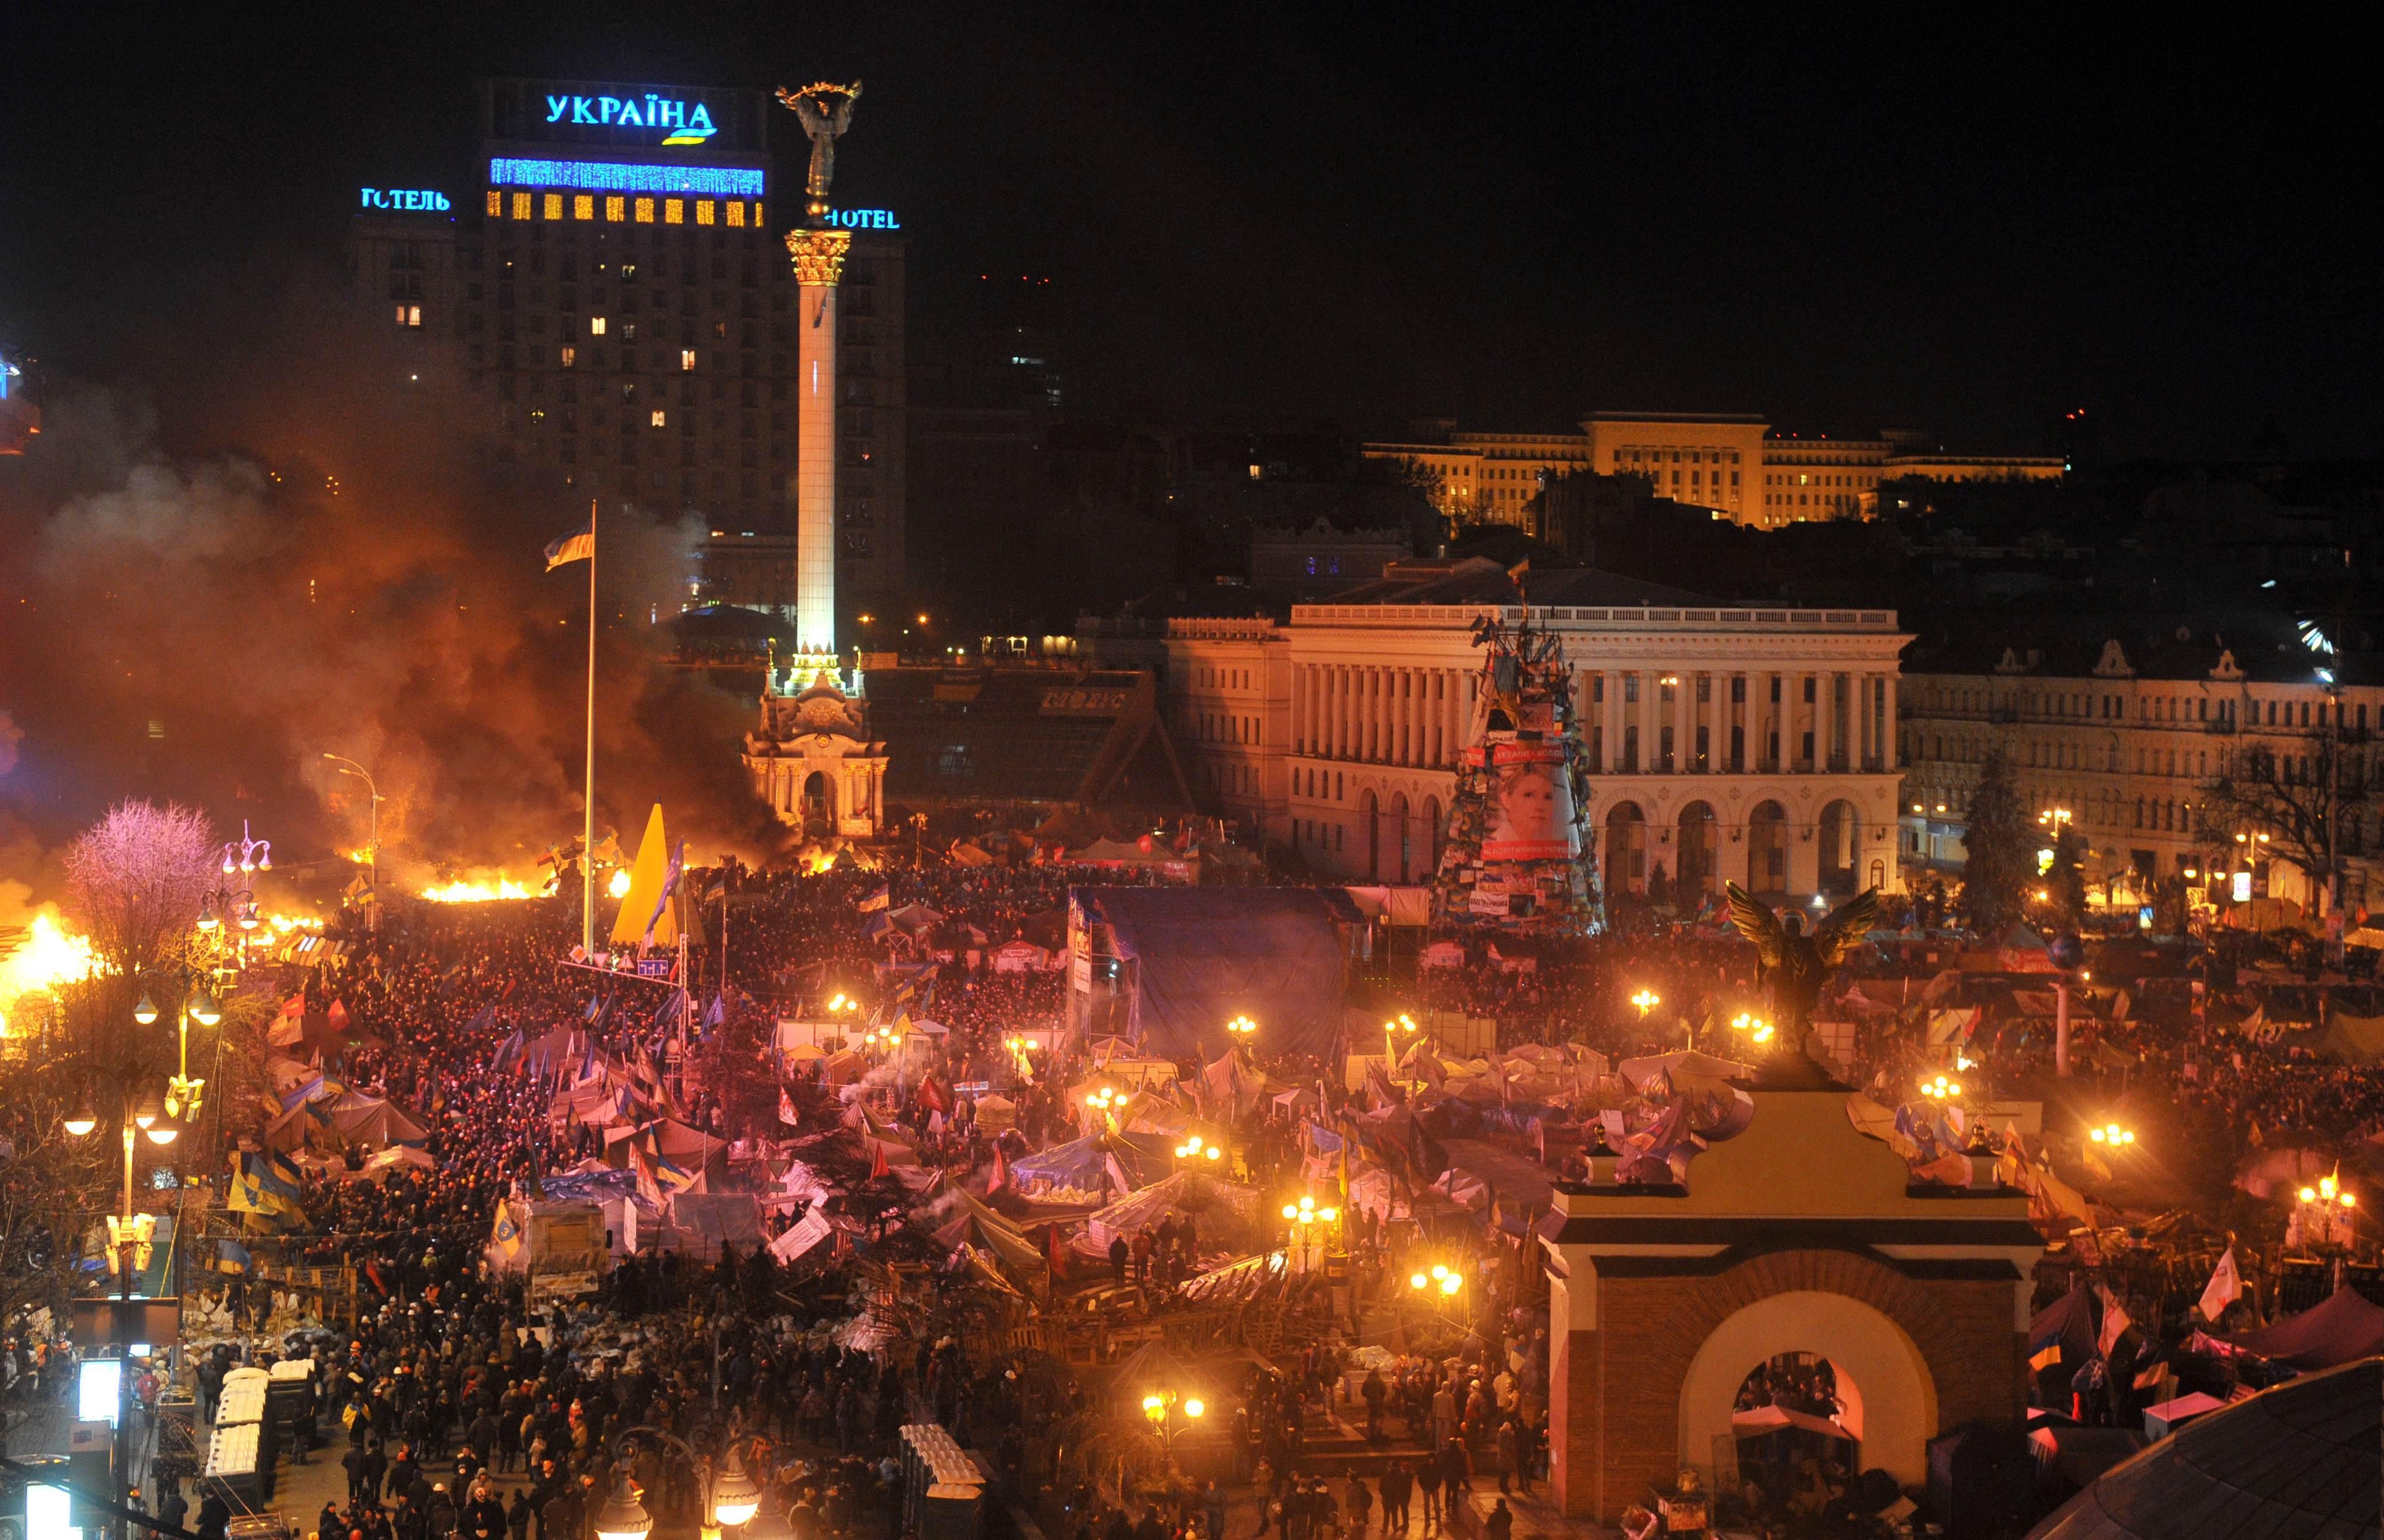 ukraine crisis Ukraine's pm warns of 'tough reforms .